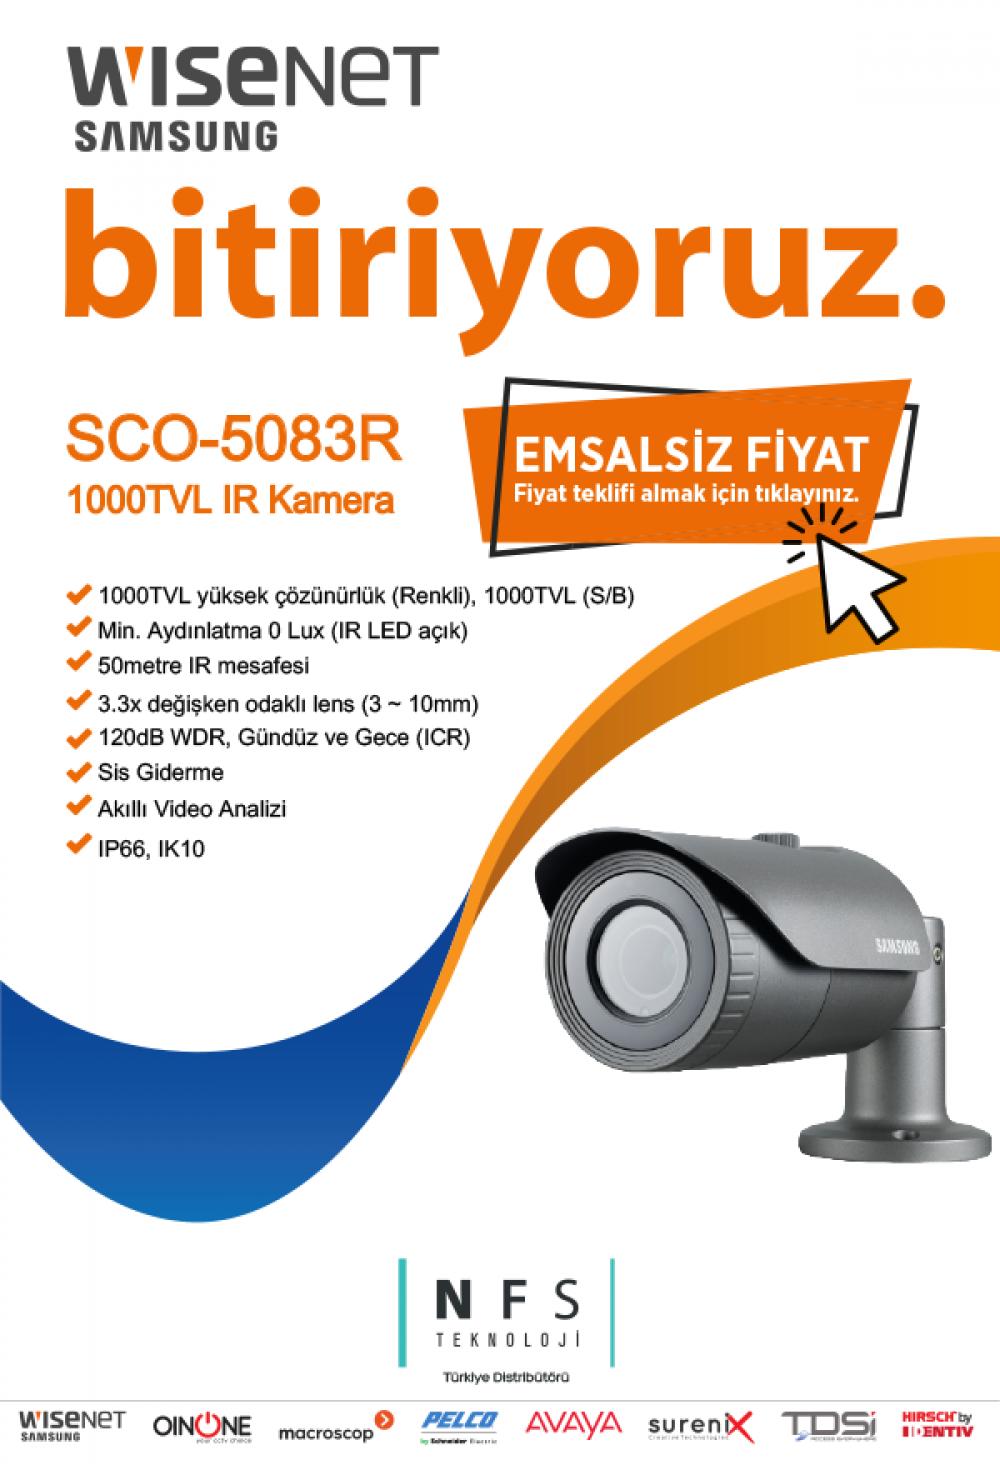 Samsung Wisenet SCO-5083R | 1000TVL IR Kamera